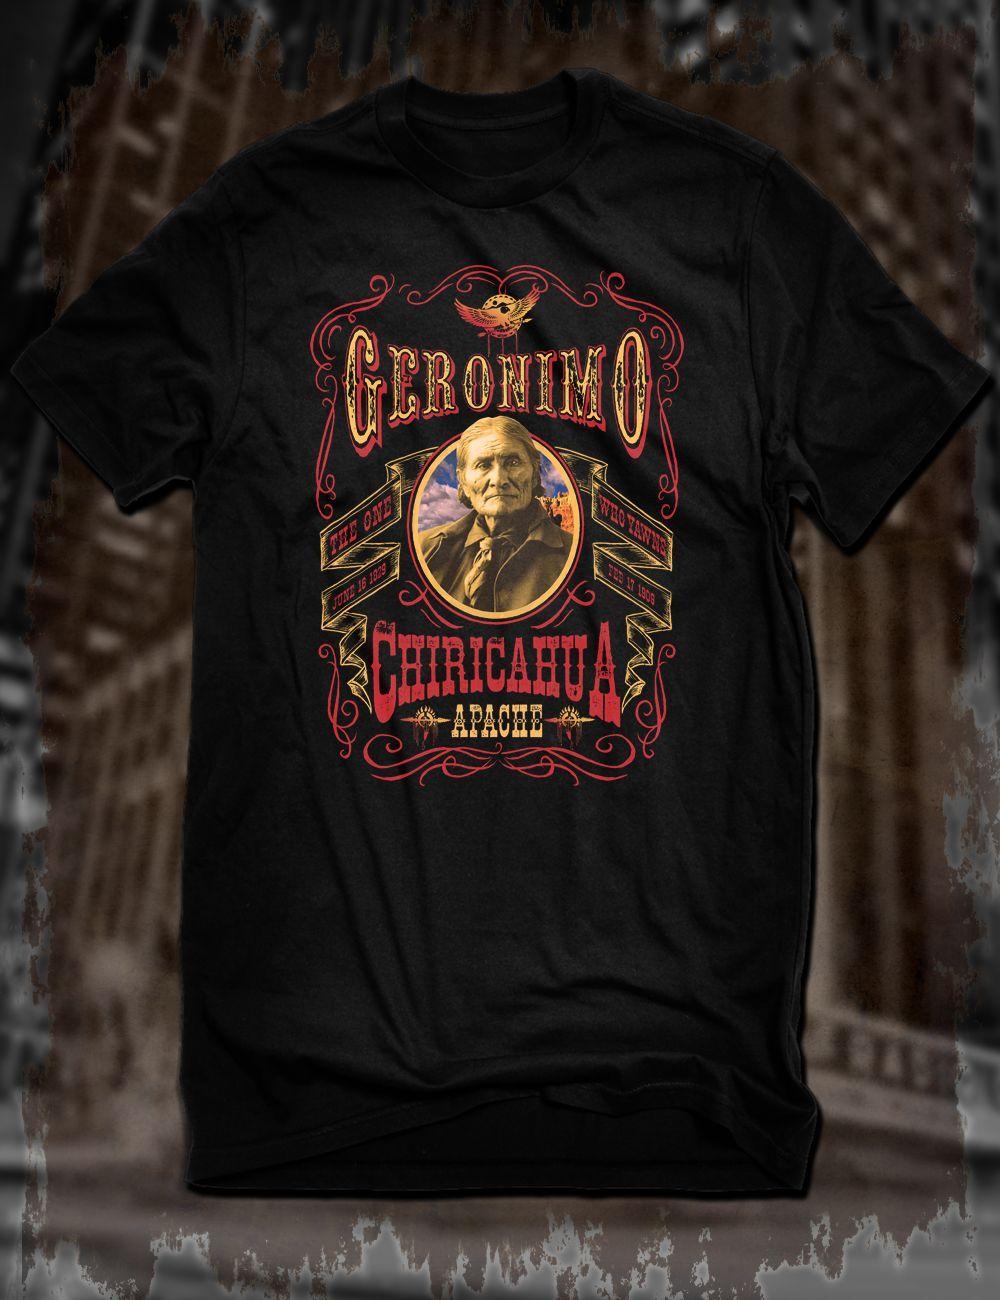 New Black Geronimo T-Shirt Native American Leader Tee Chiricahua Apache Old West